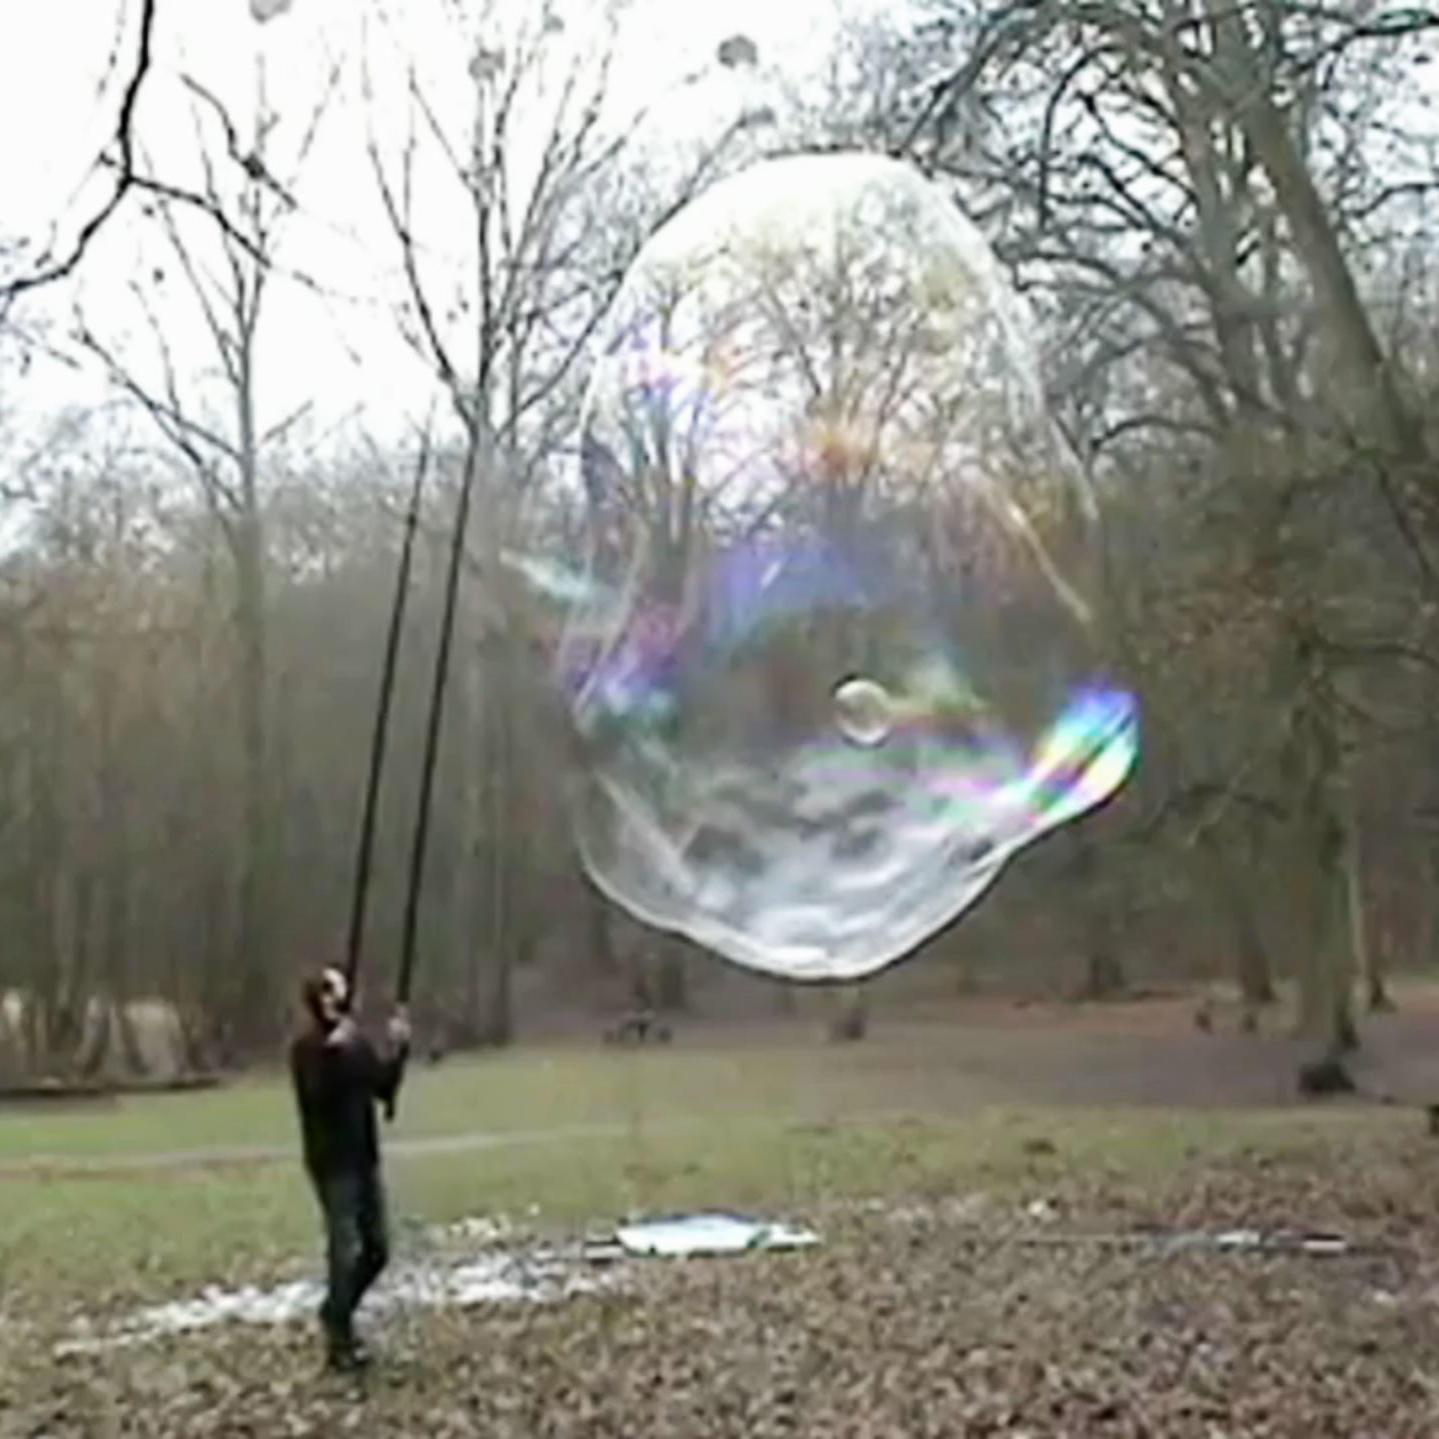 How Chemistry Creates Really Big Bubbles